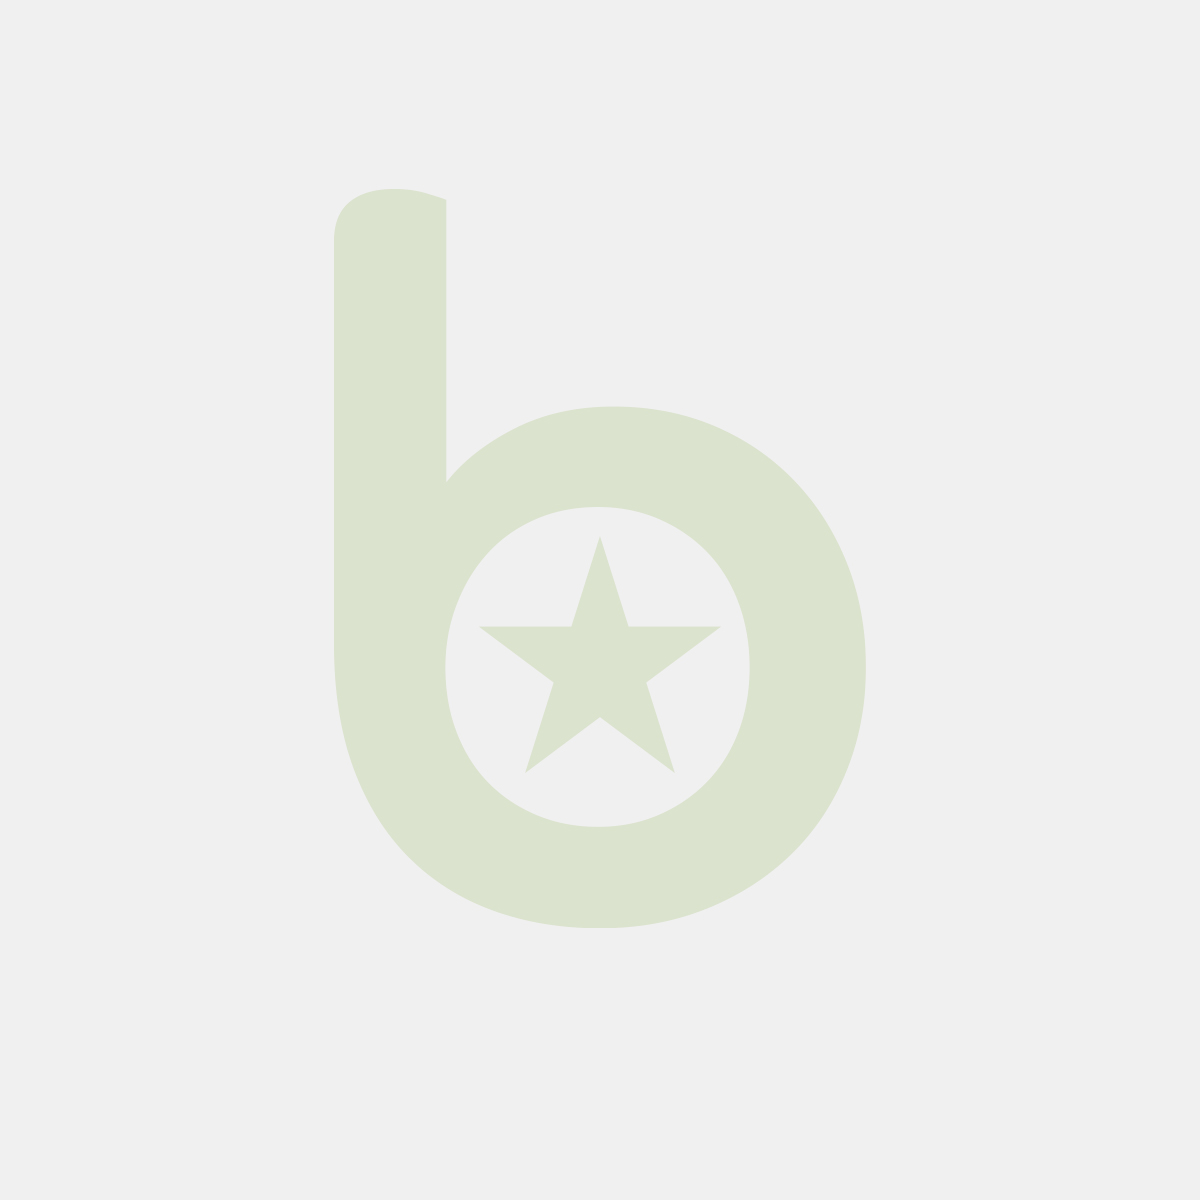 Garnek Budget Line Z Pokrywkami 71 L; Śr. 450 X 450 H